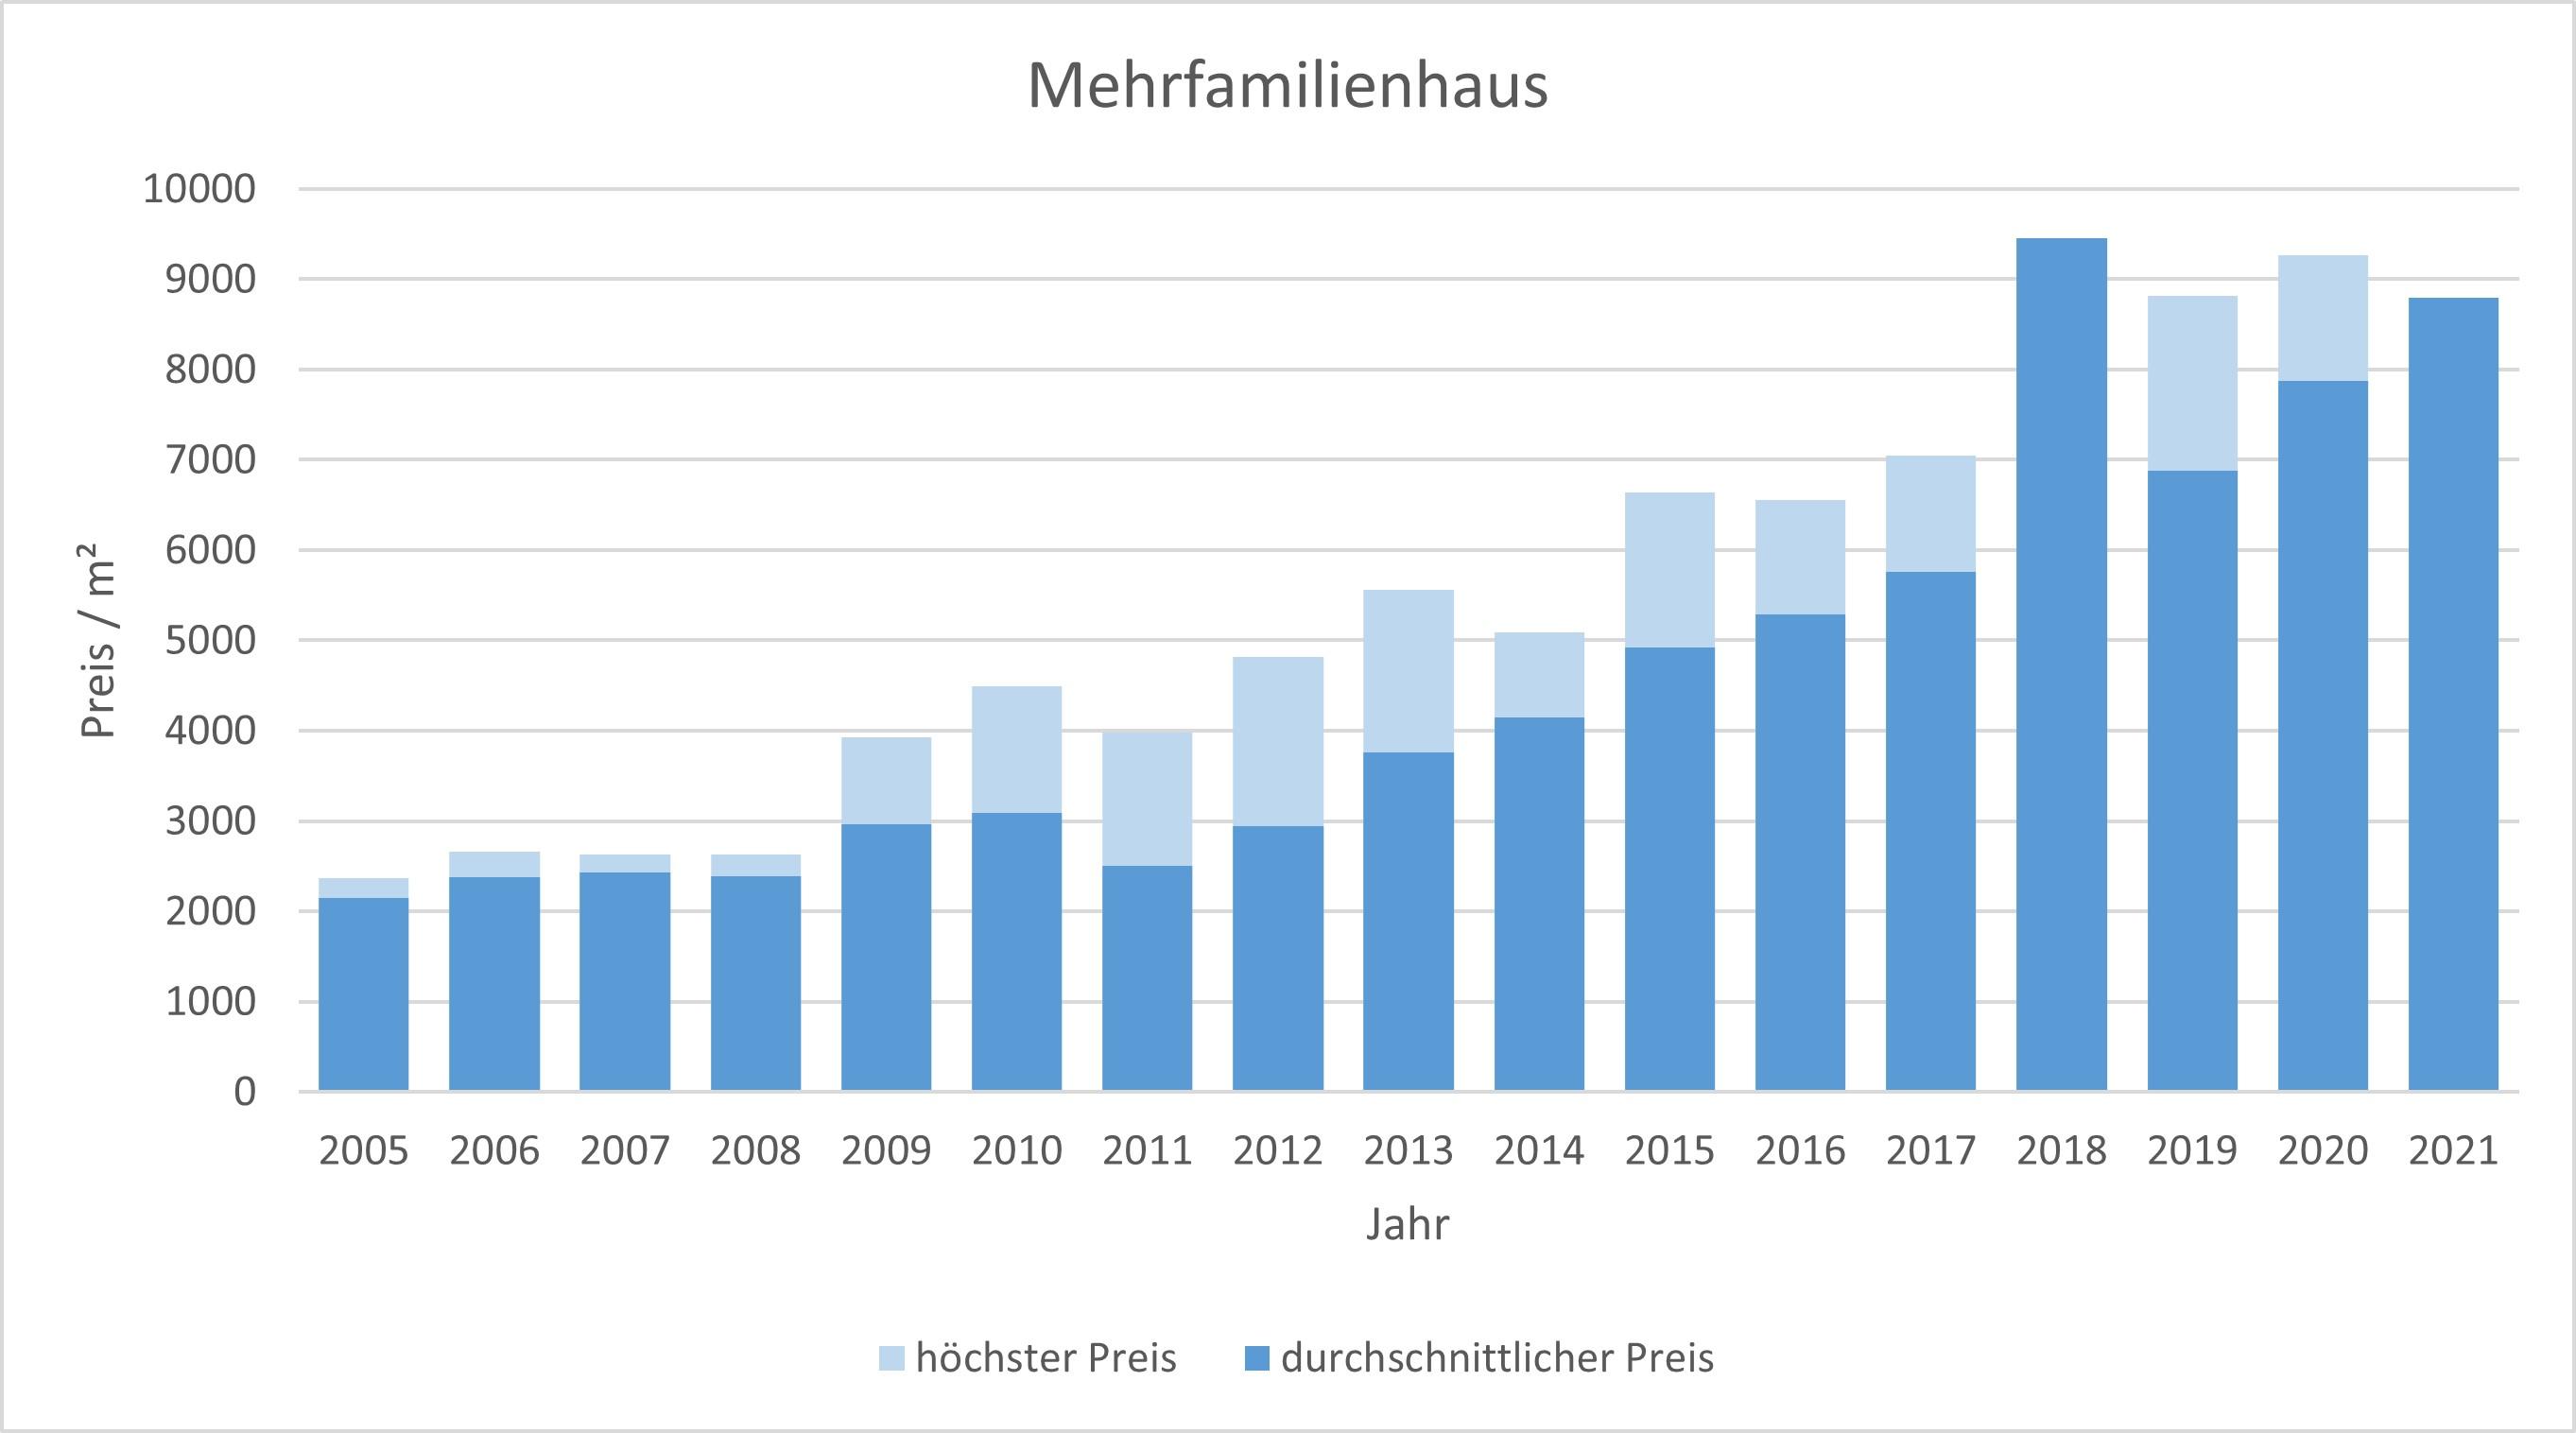 Gauting Mehrfamilienhaus kaufen verkaufen Preis Bewertung Makler www.happy-immo.de 2019 2020 2021